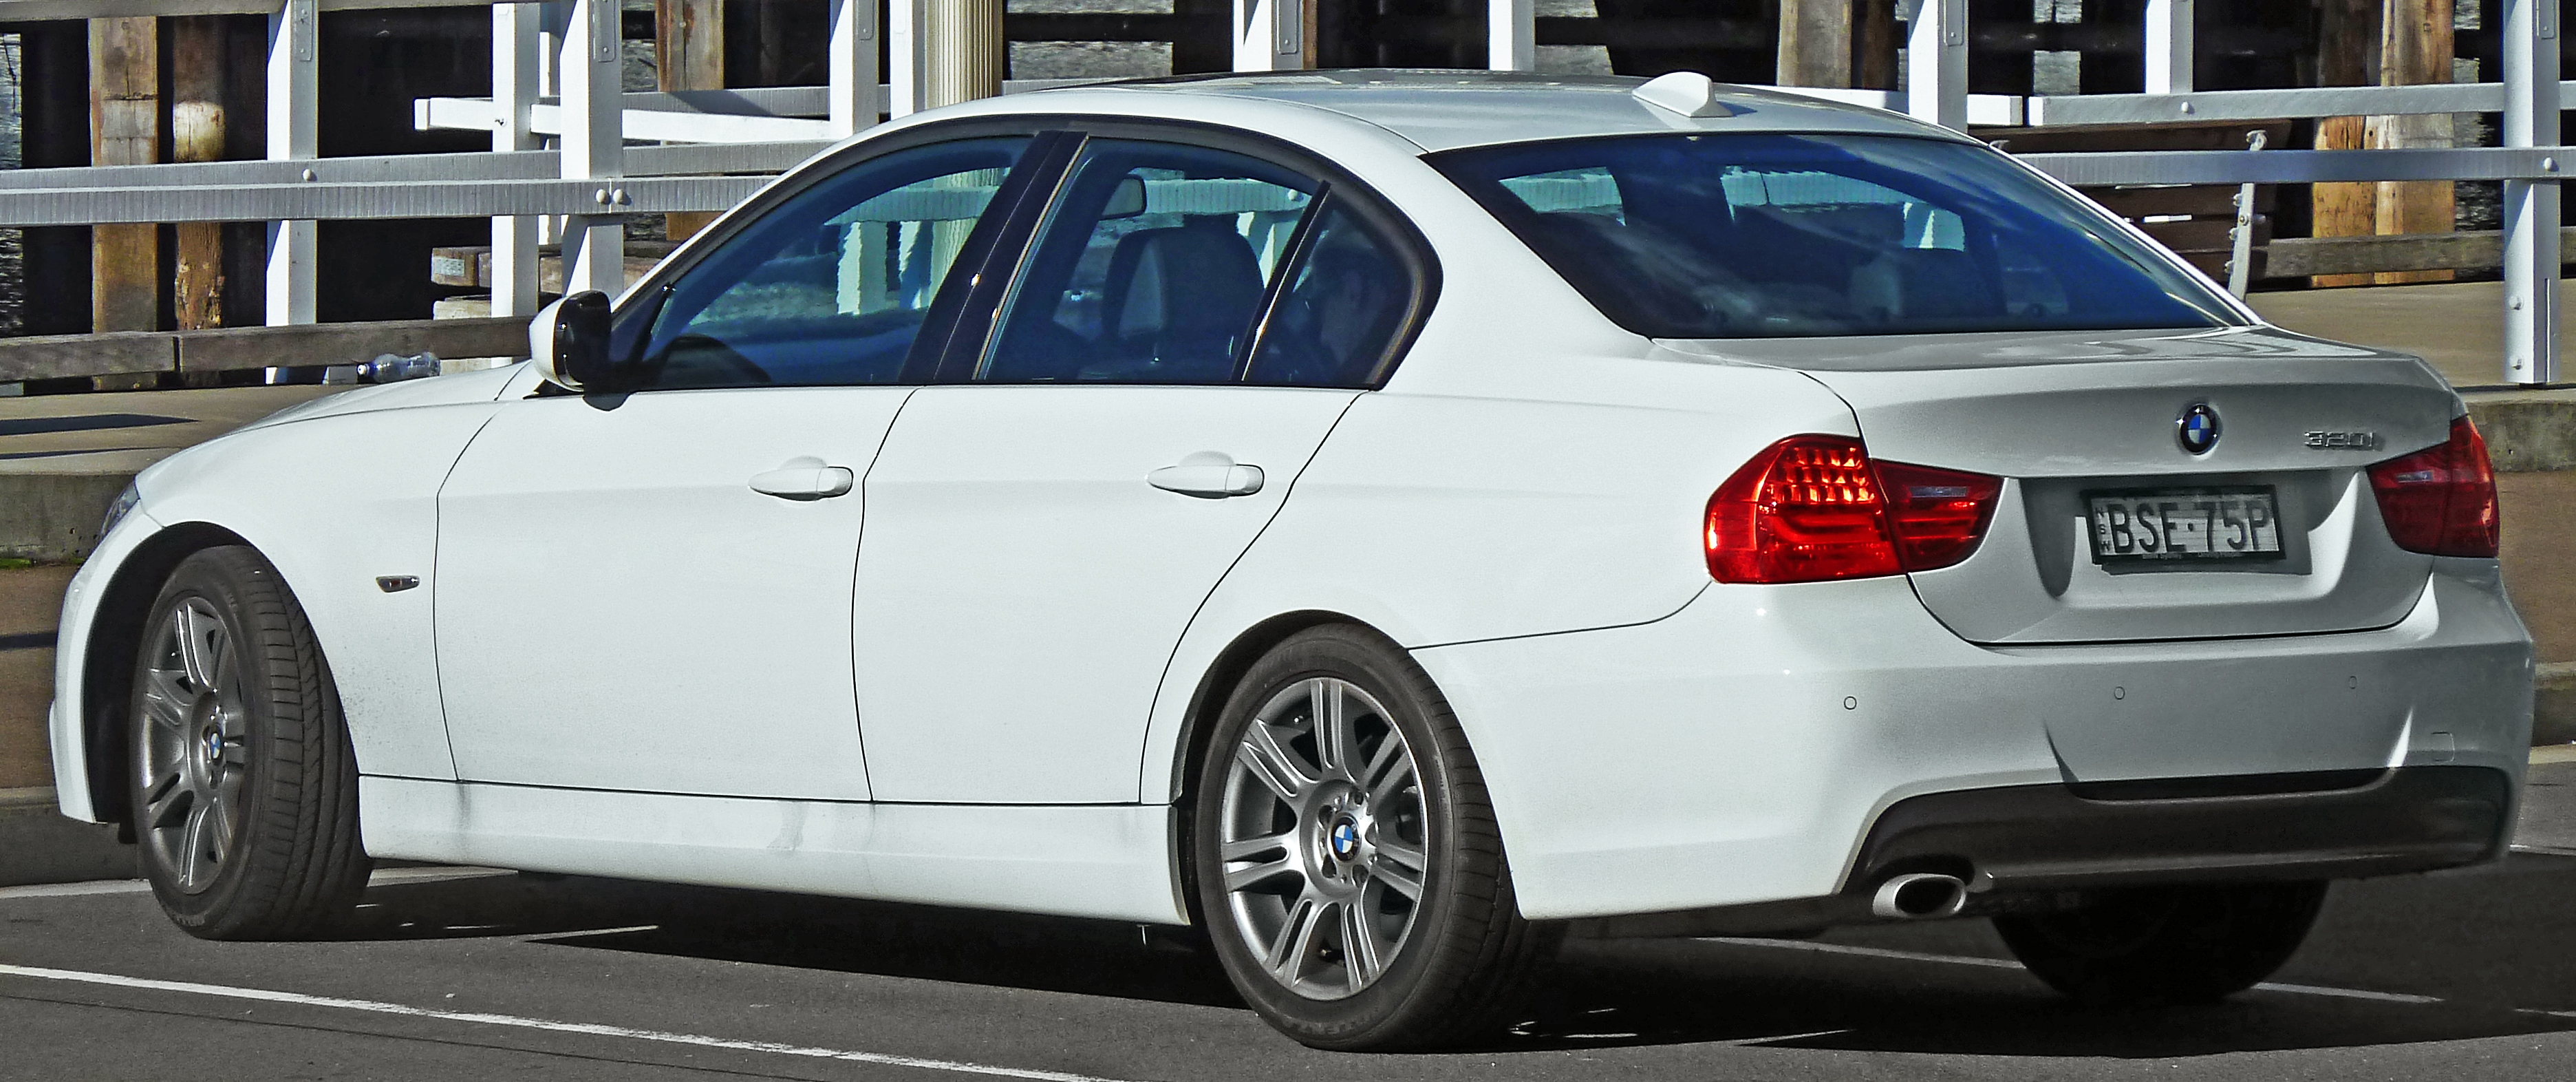 Bmw E90 Wiki >> File:2008-2011 BMW 320i (E90) sedan (2011-03-23).jpg - Wikimedia Commons